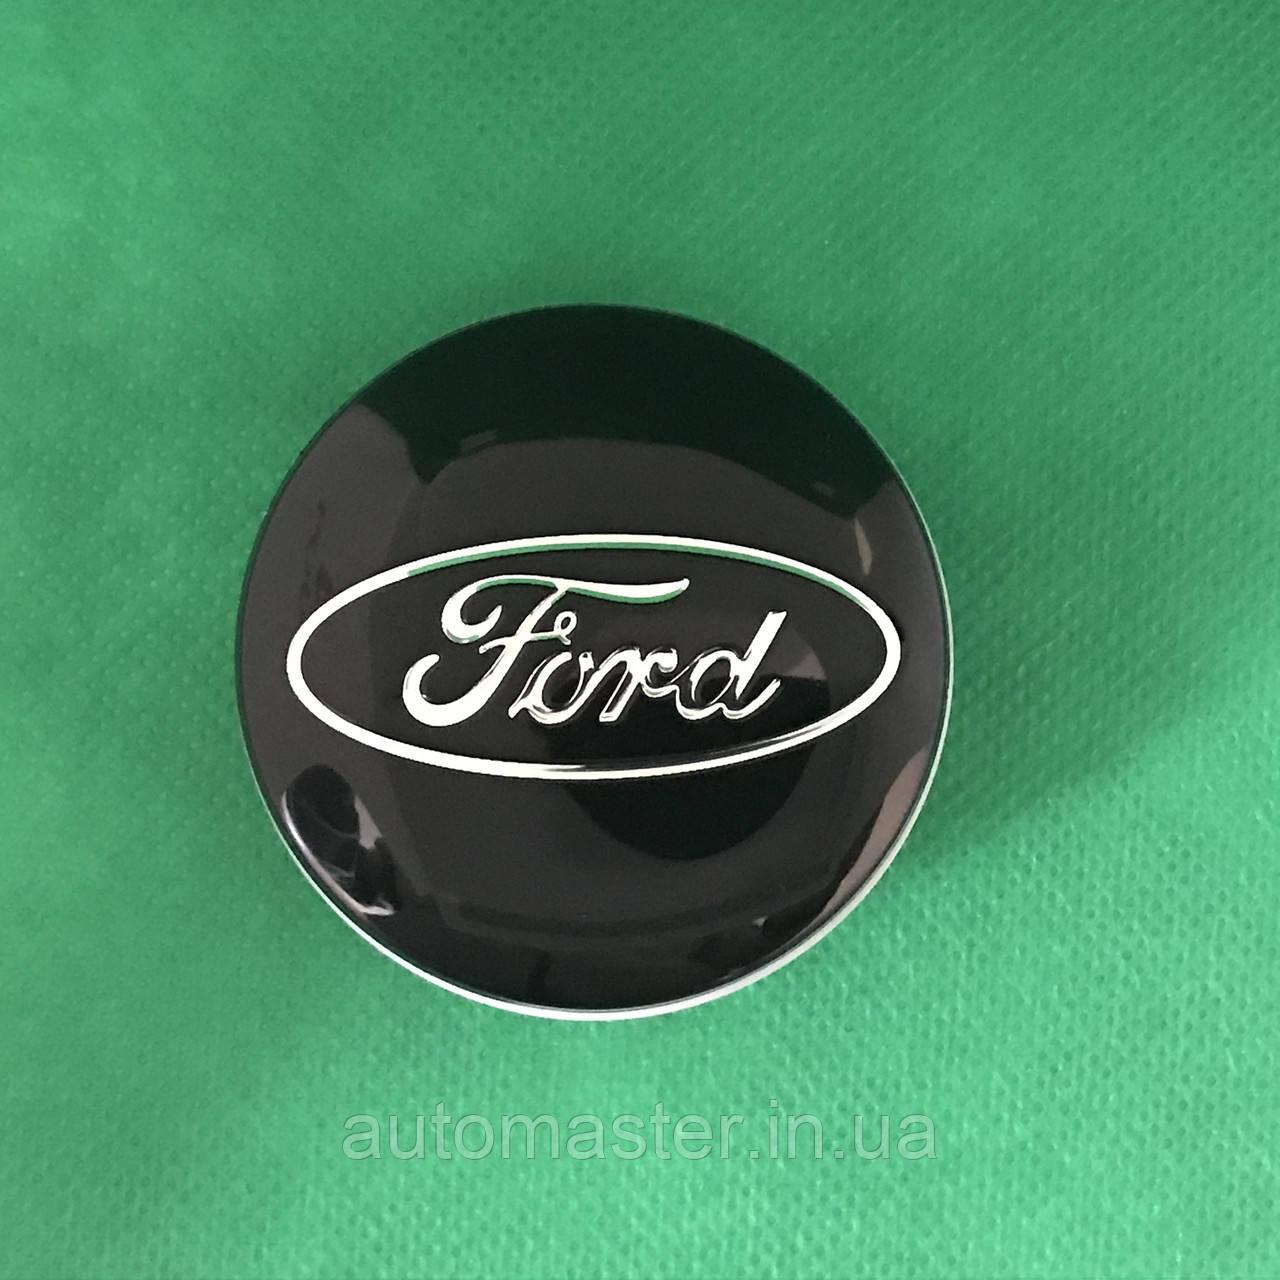 Ковпачки заглушки на литі диски Ford Mondeo, Kuga, Escort 54/50/9, 6M21-1003-AA, чорні